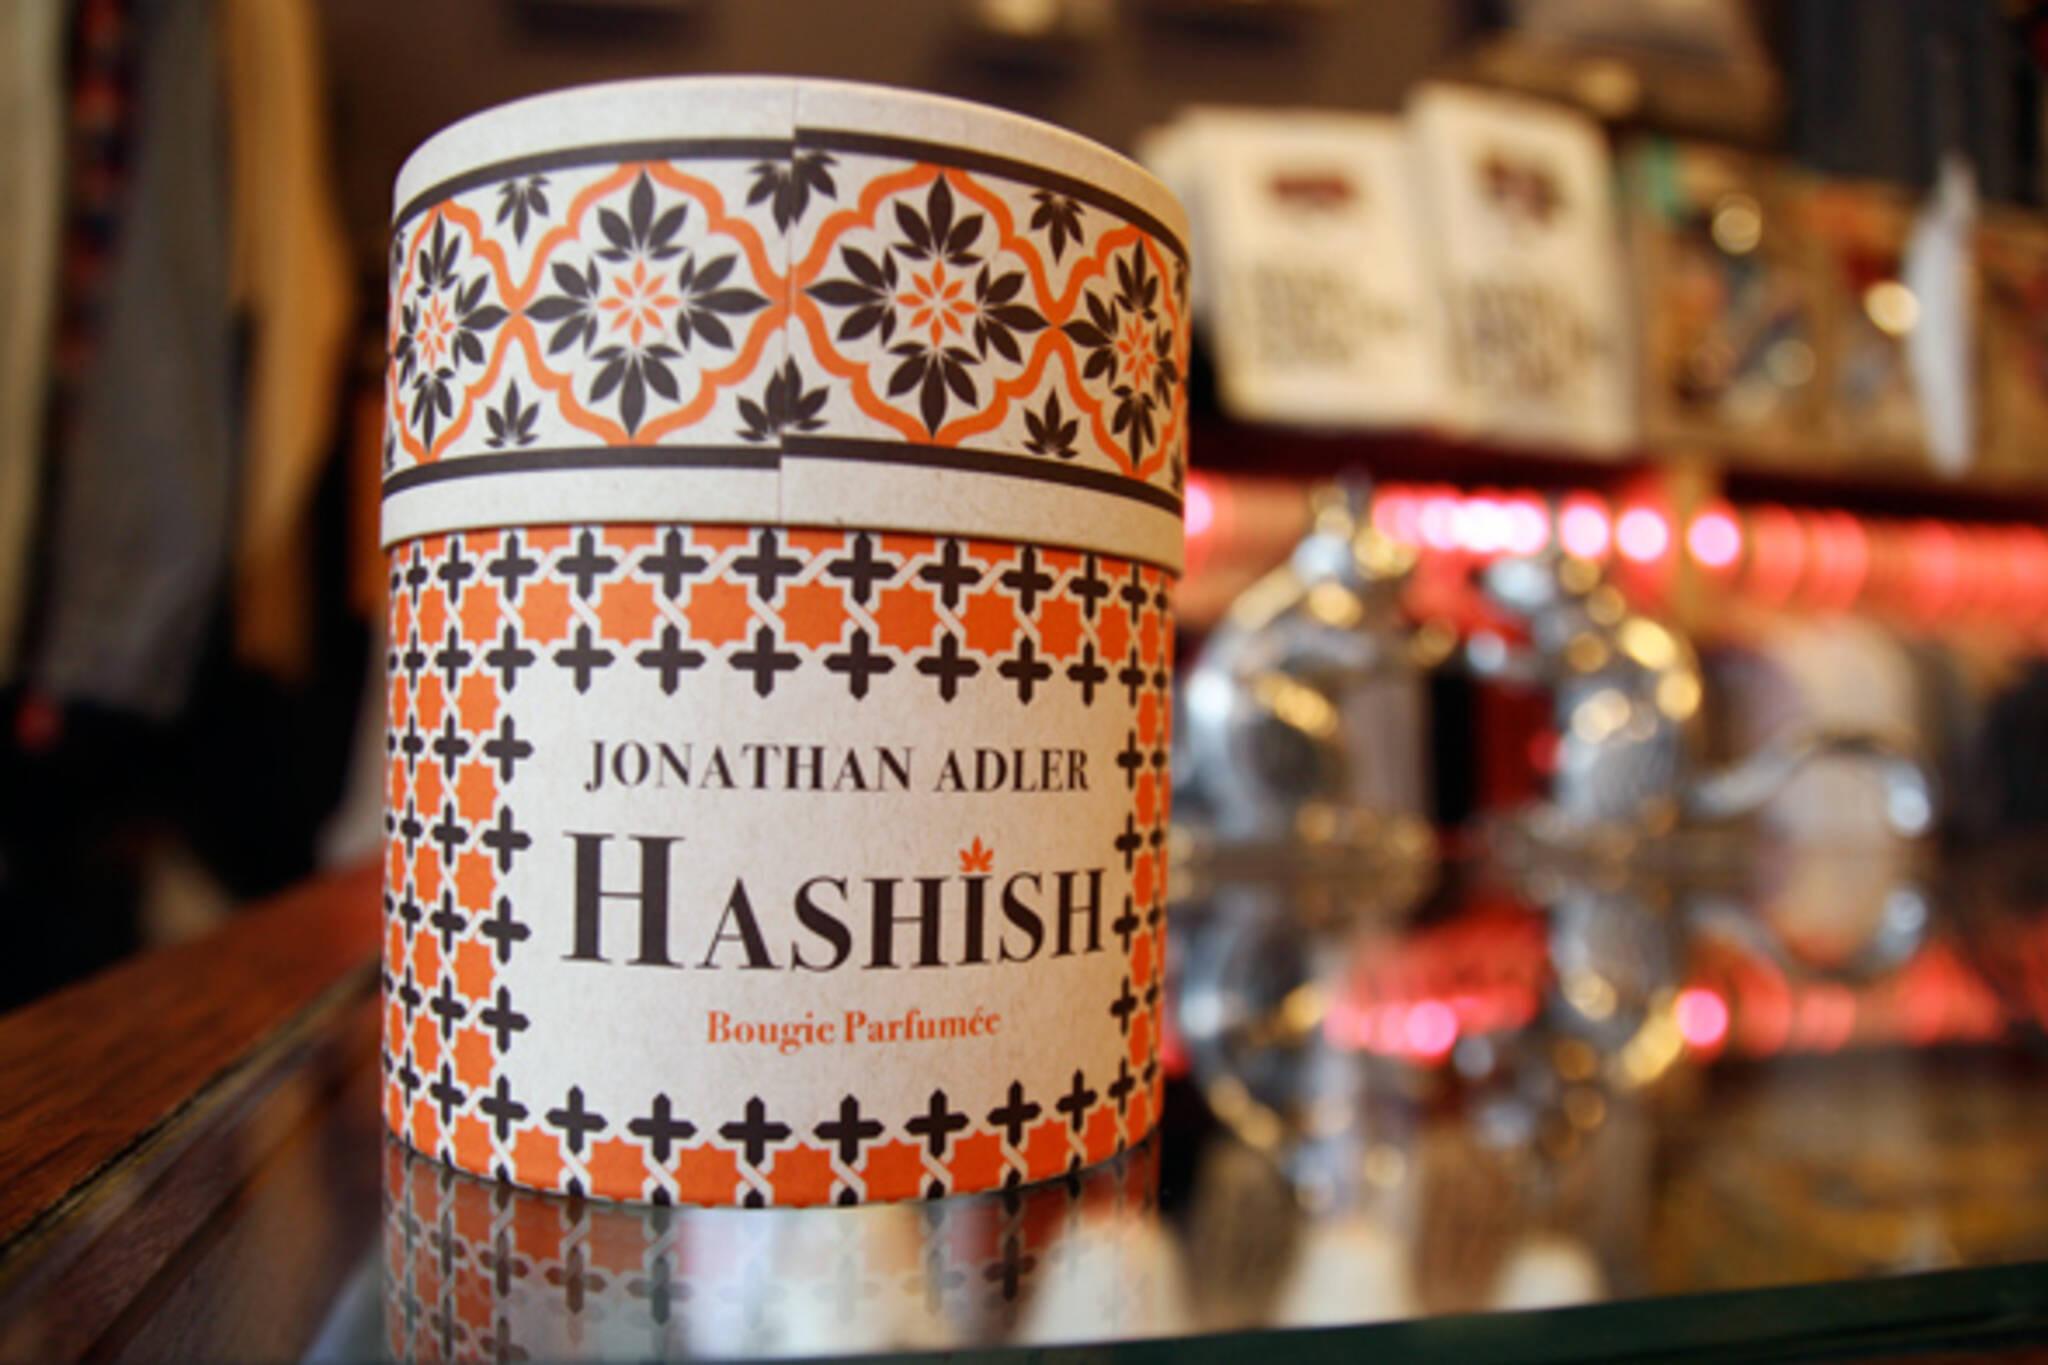 Jonathan Adler hashish candle